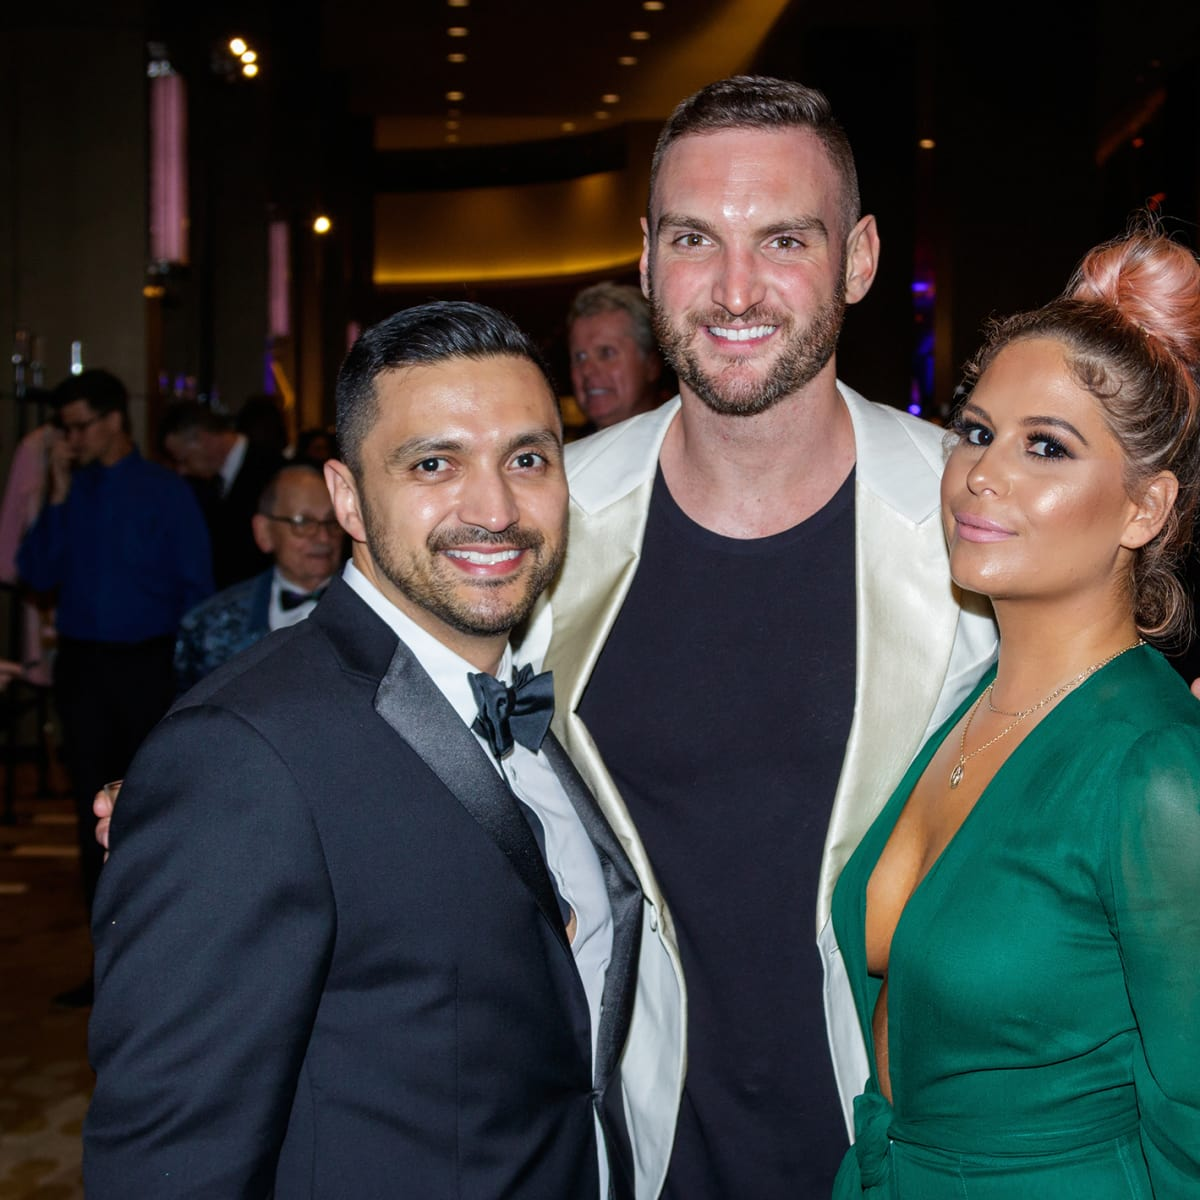 Ruben Ortiz, Phillip Murrell, Caitlin Ripp at House of DIFFA 2018